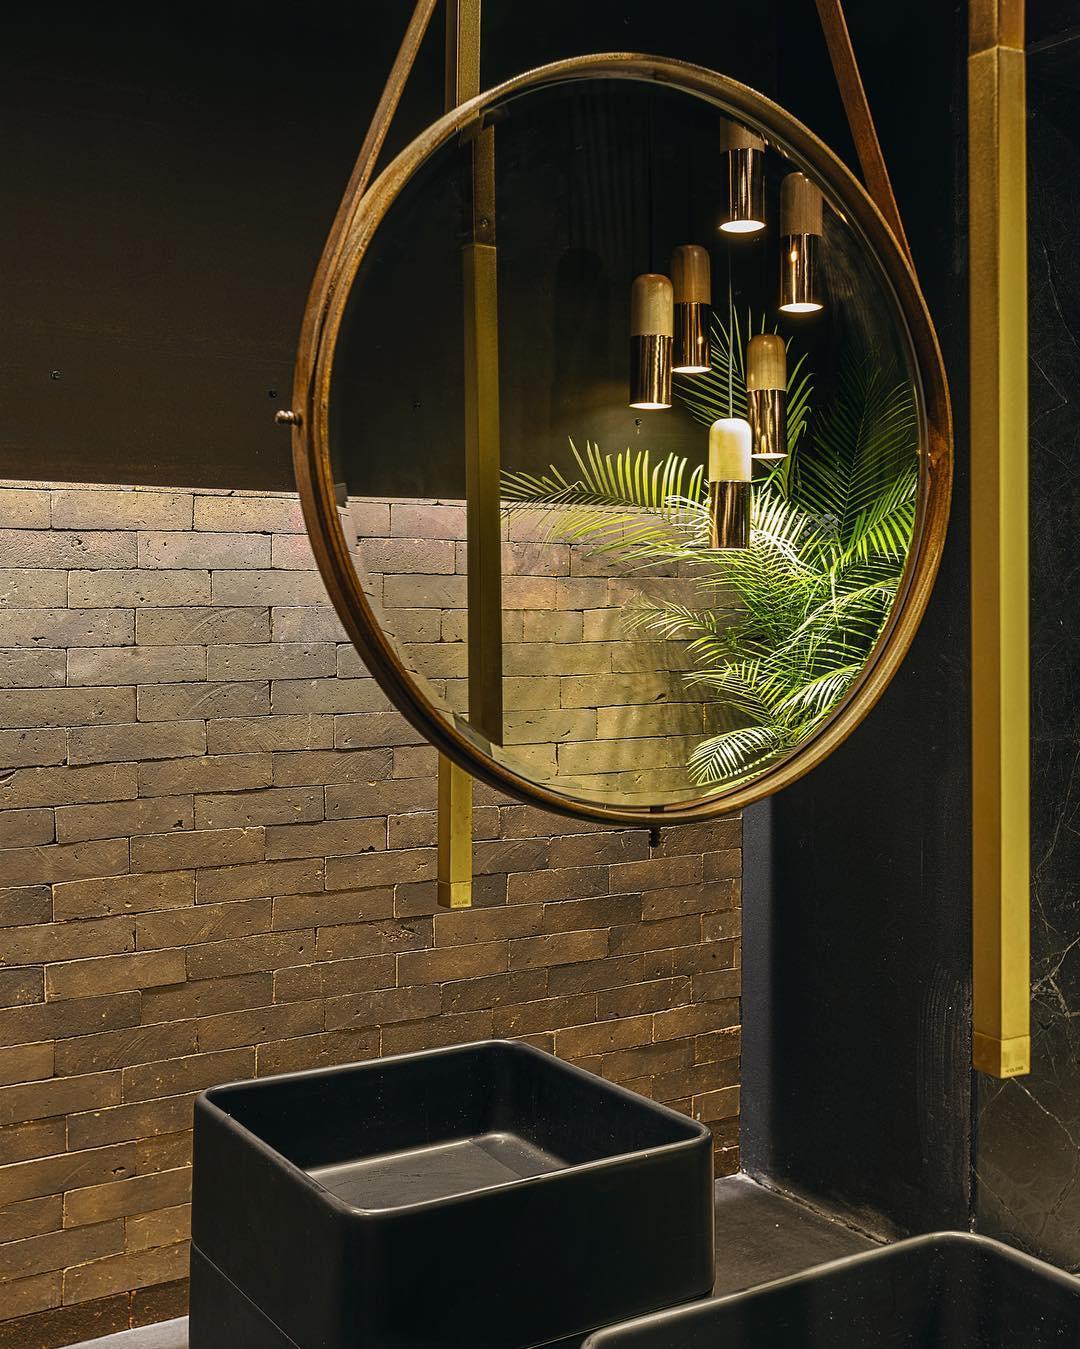 04-banheiro-publico-go-elton-rocha